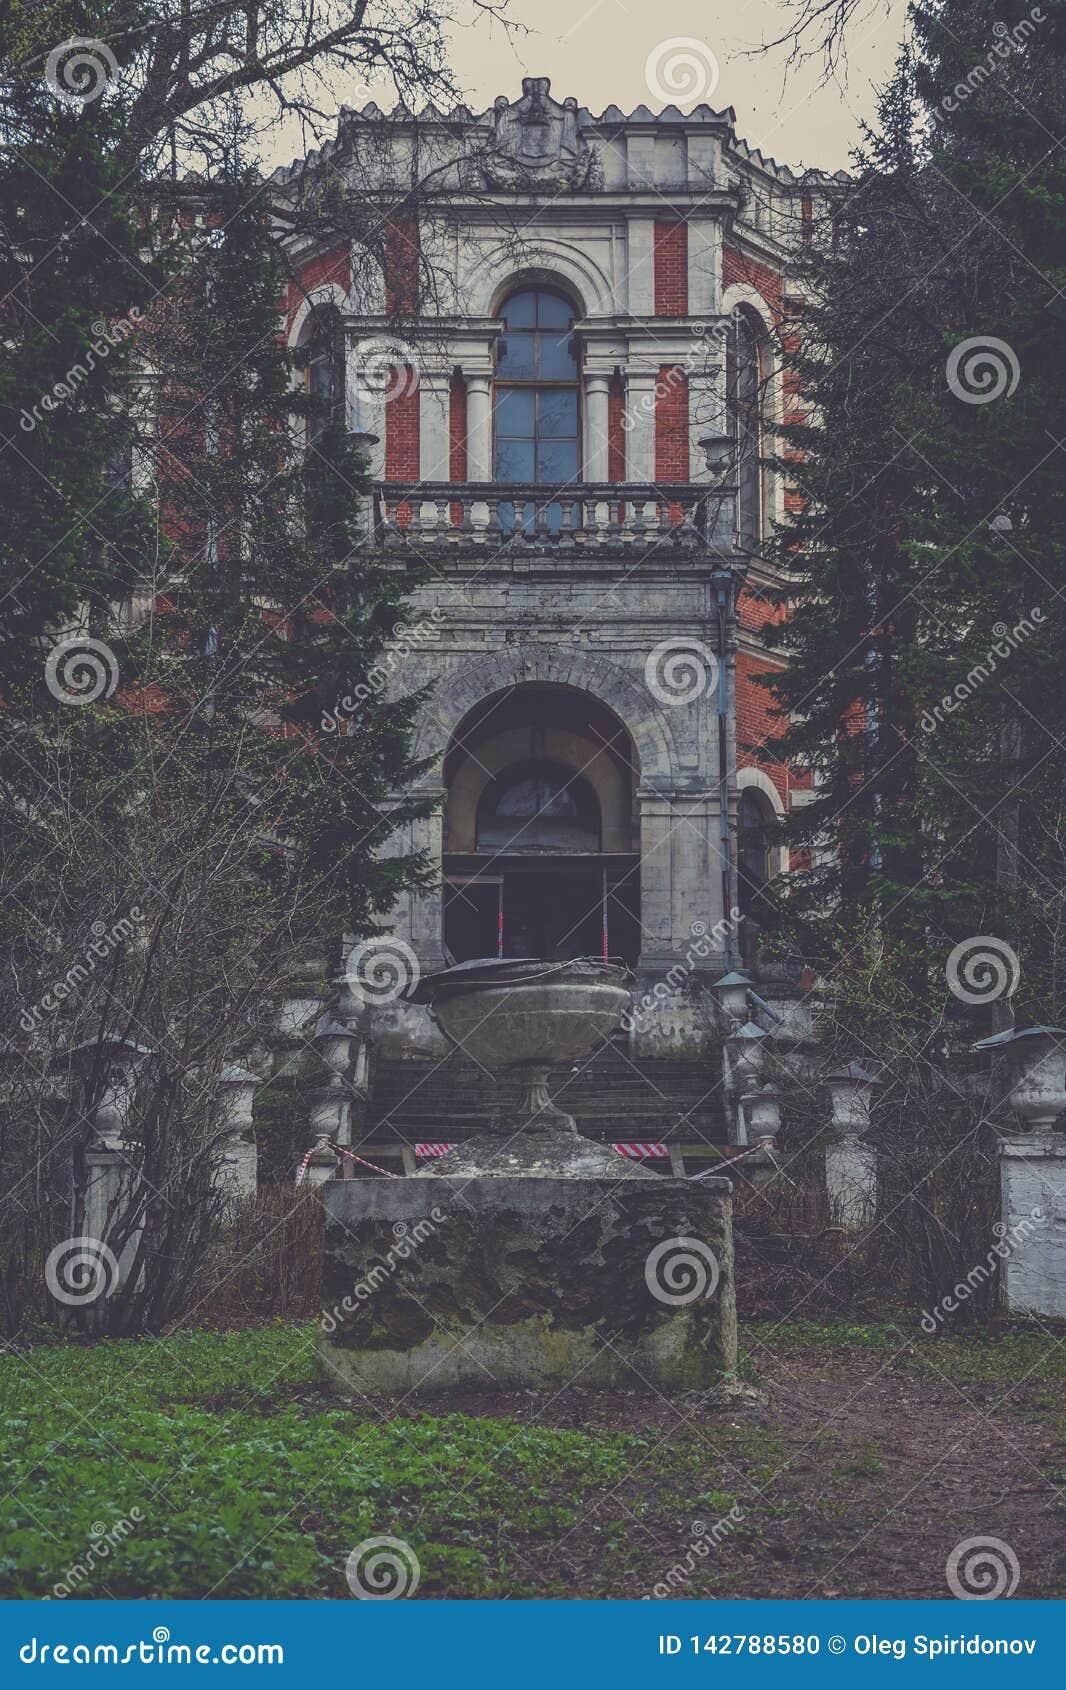 Abandoned manor, Manor in Bykovo